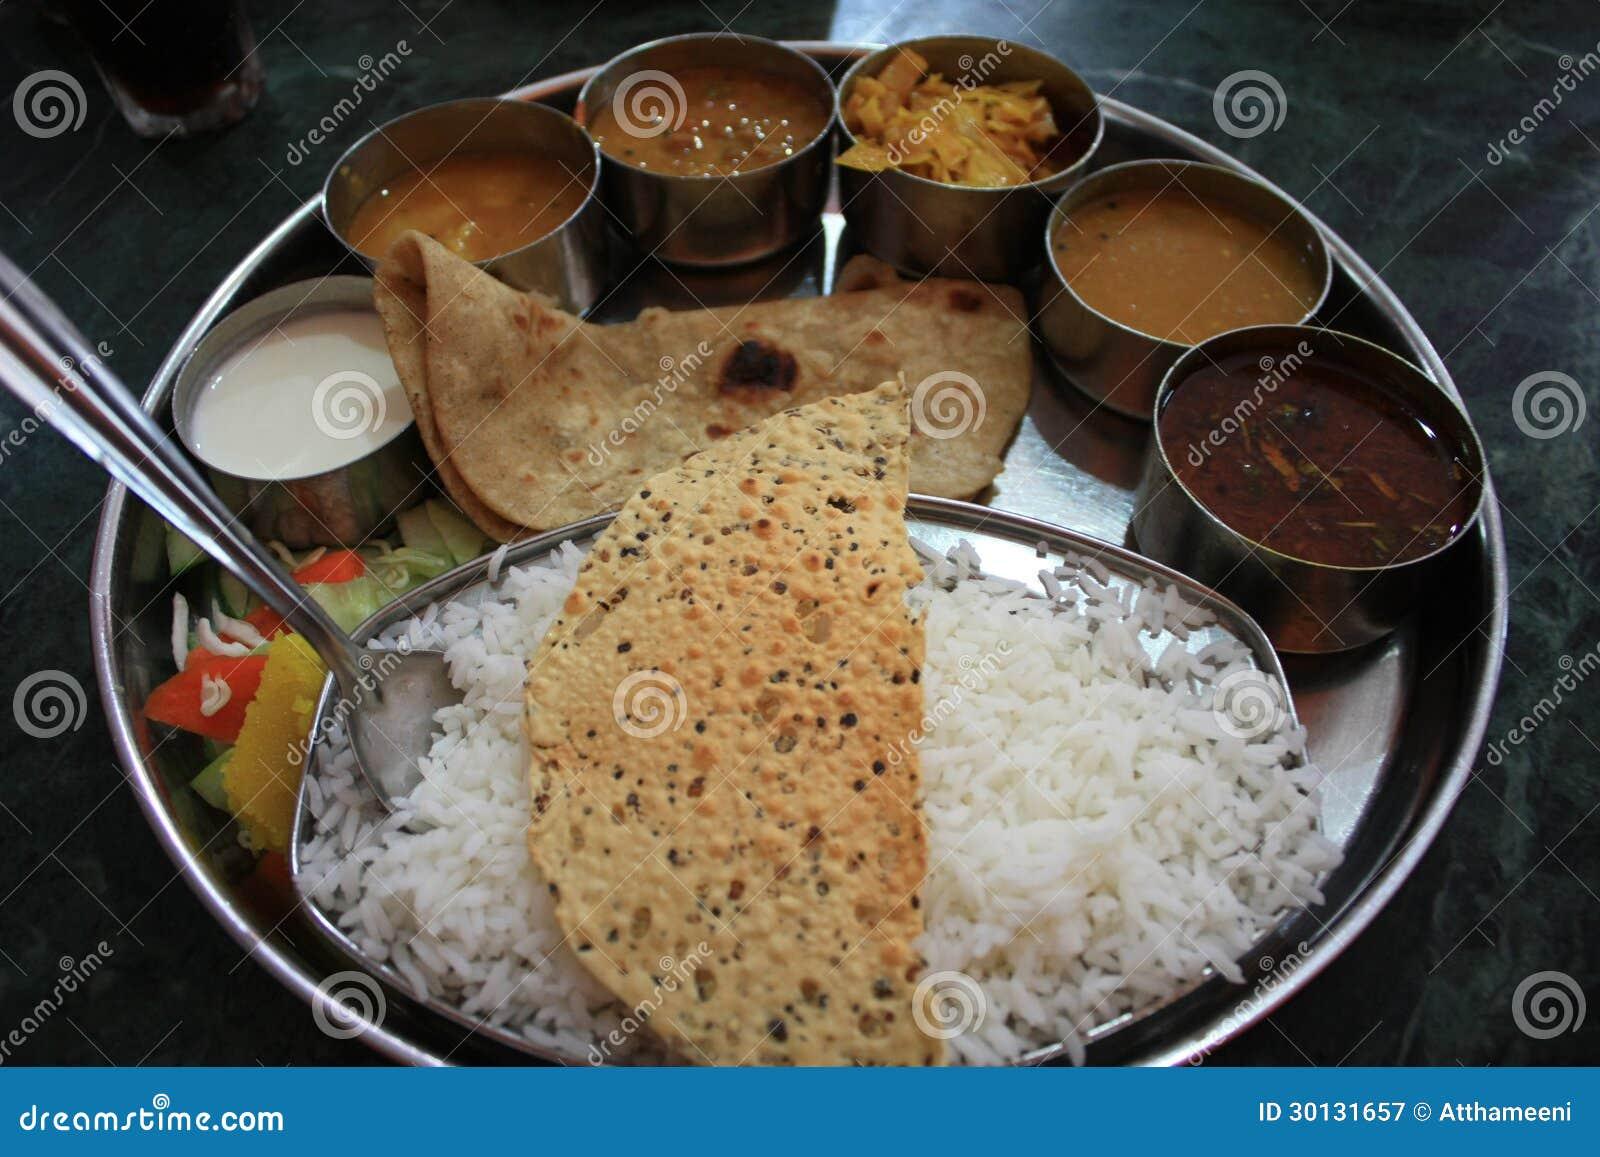 Indian Food Thali Stock Image Image Of Paneer Serving 30131657